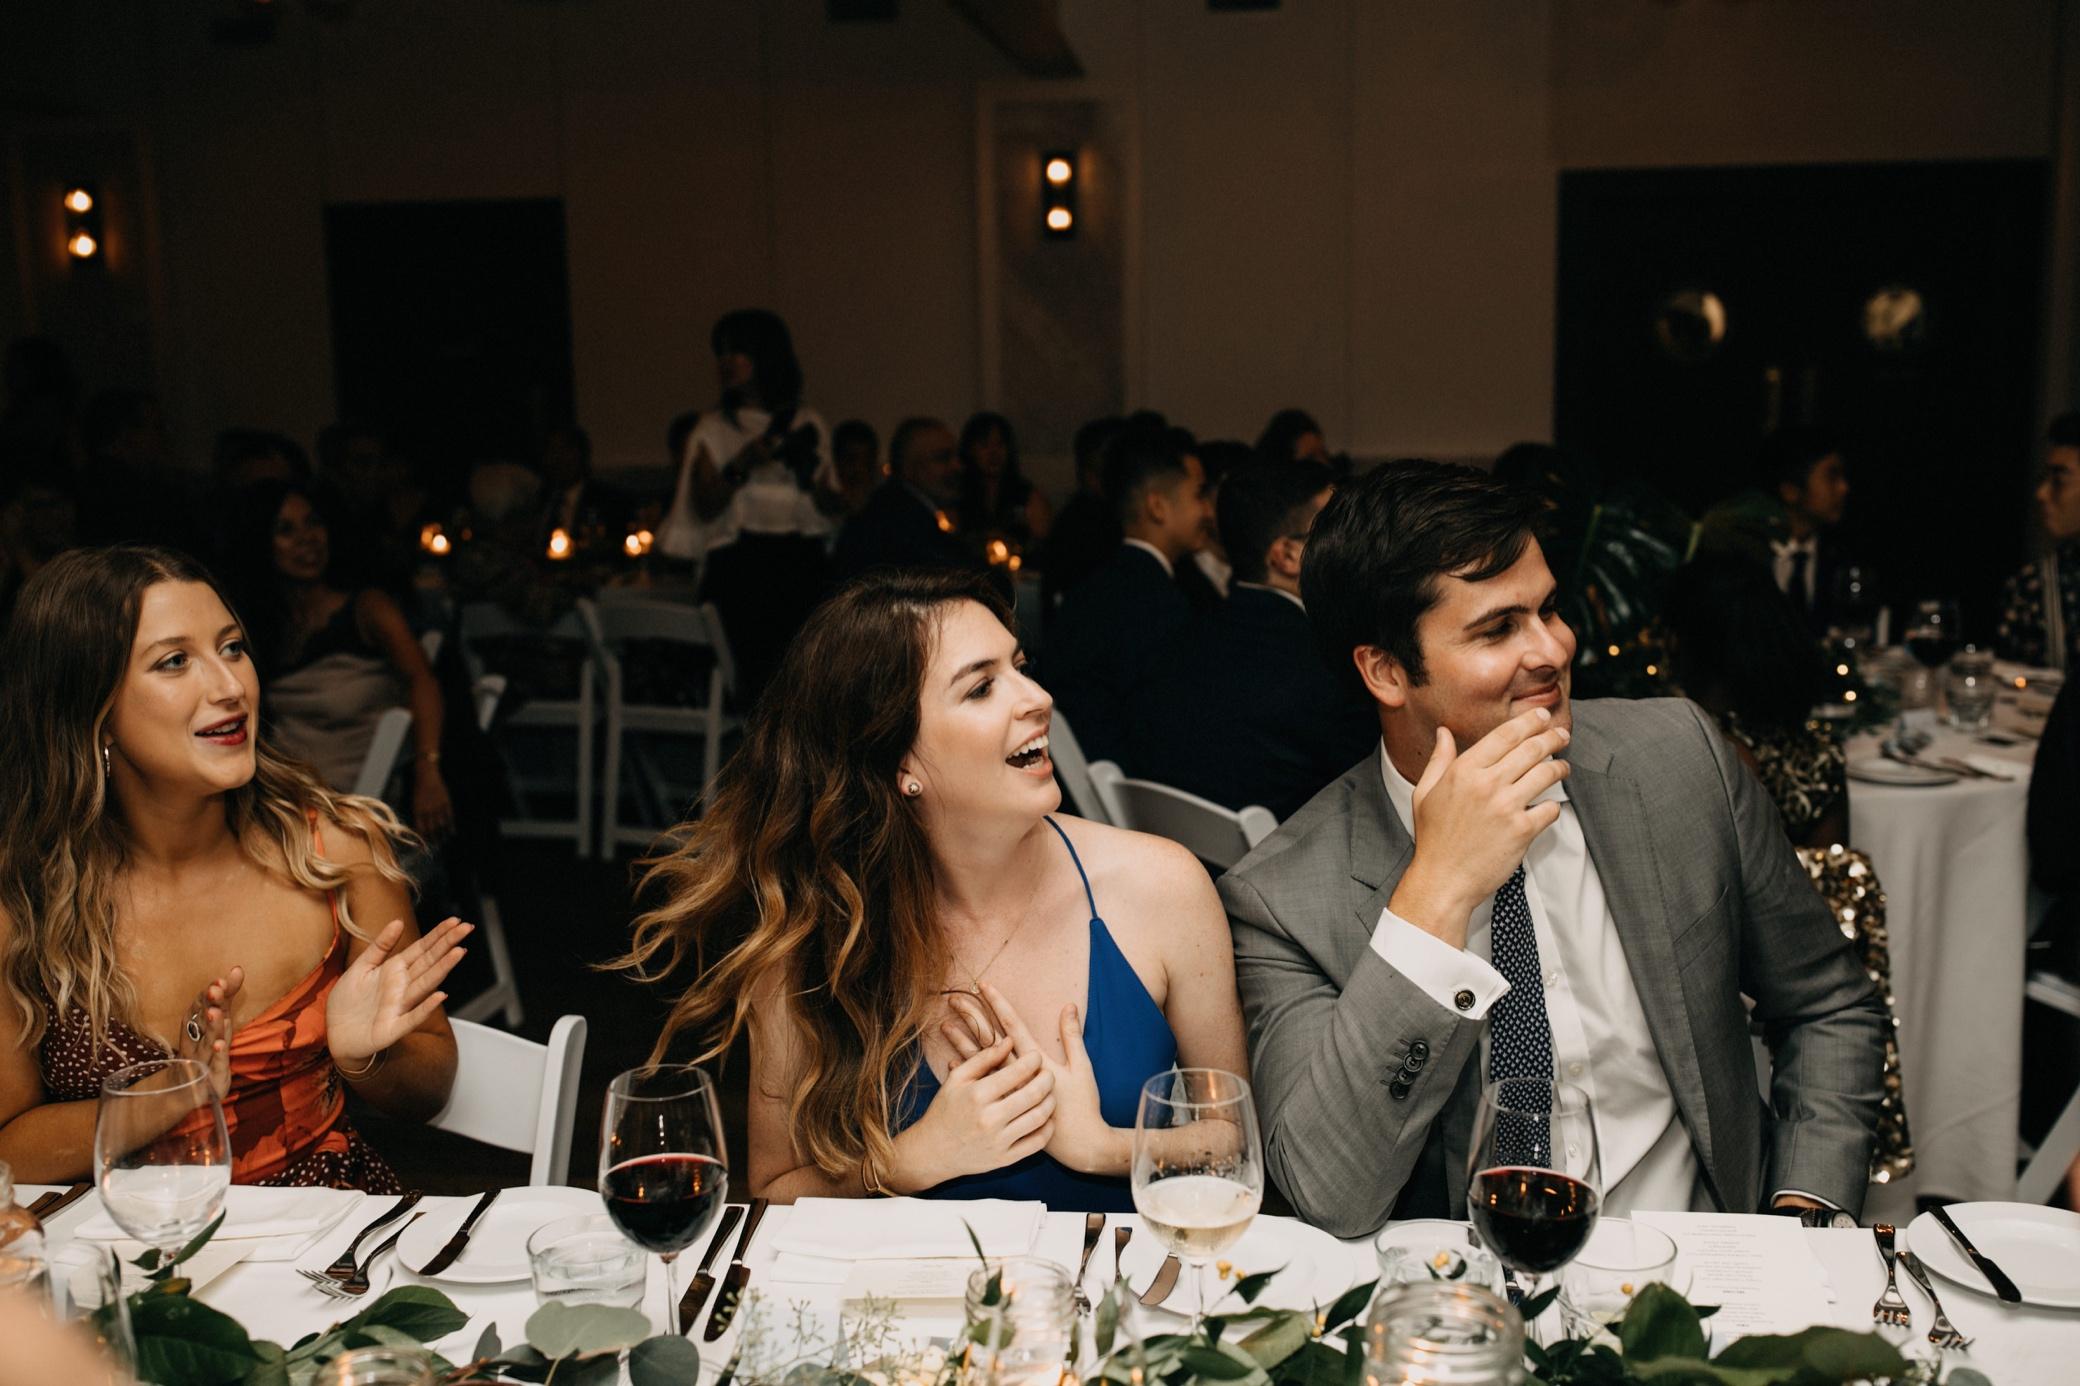 099_The Broadview Hotel Wedding (631 of 913).jpg